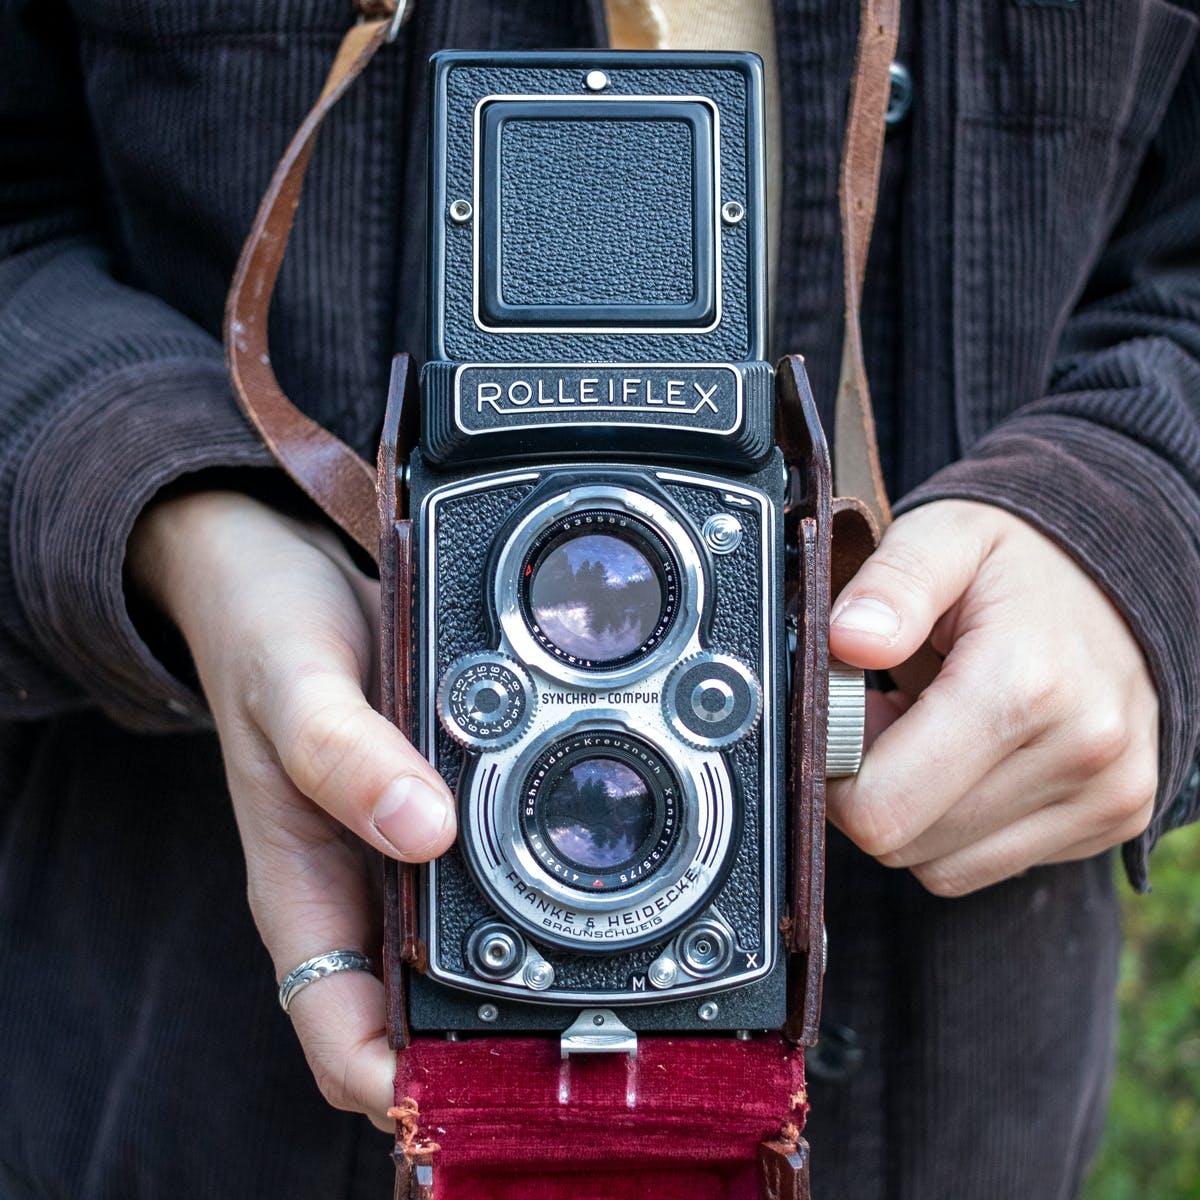 Victory Camera